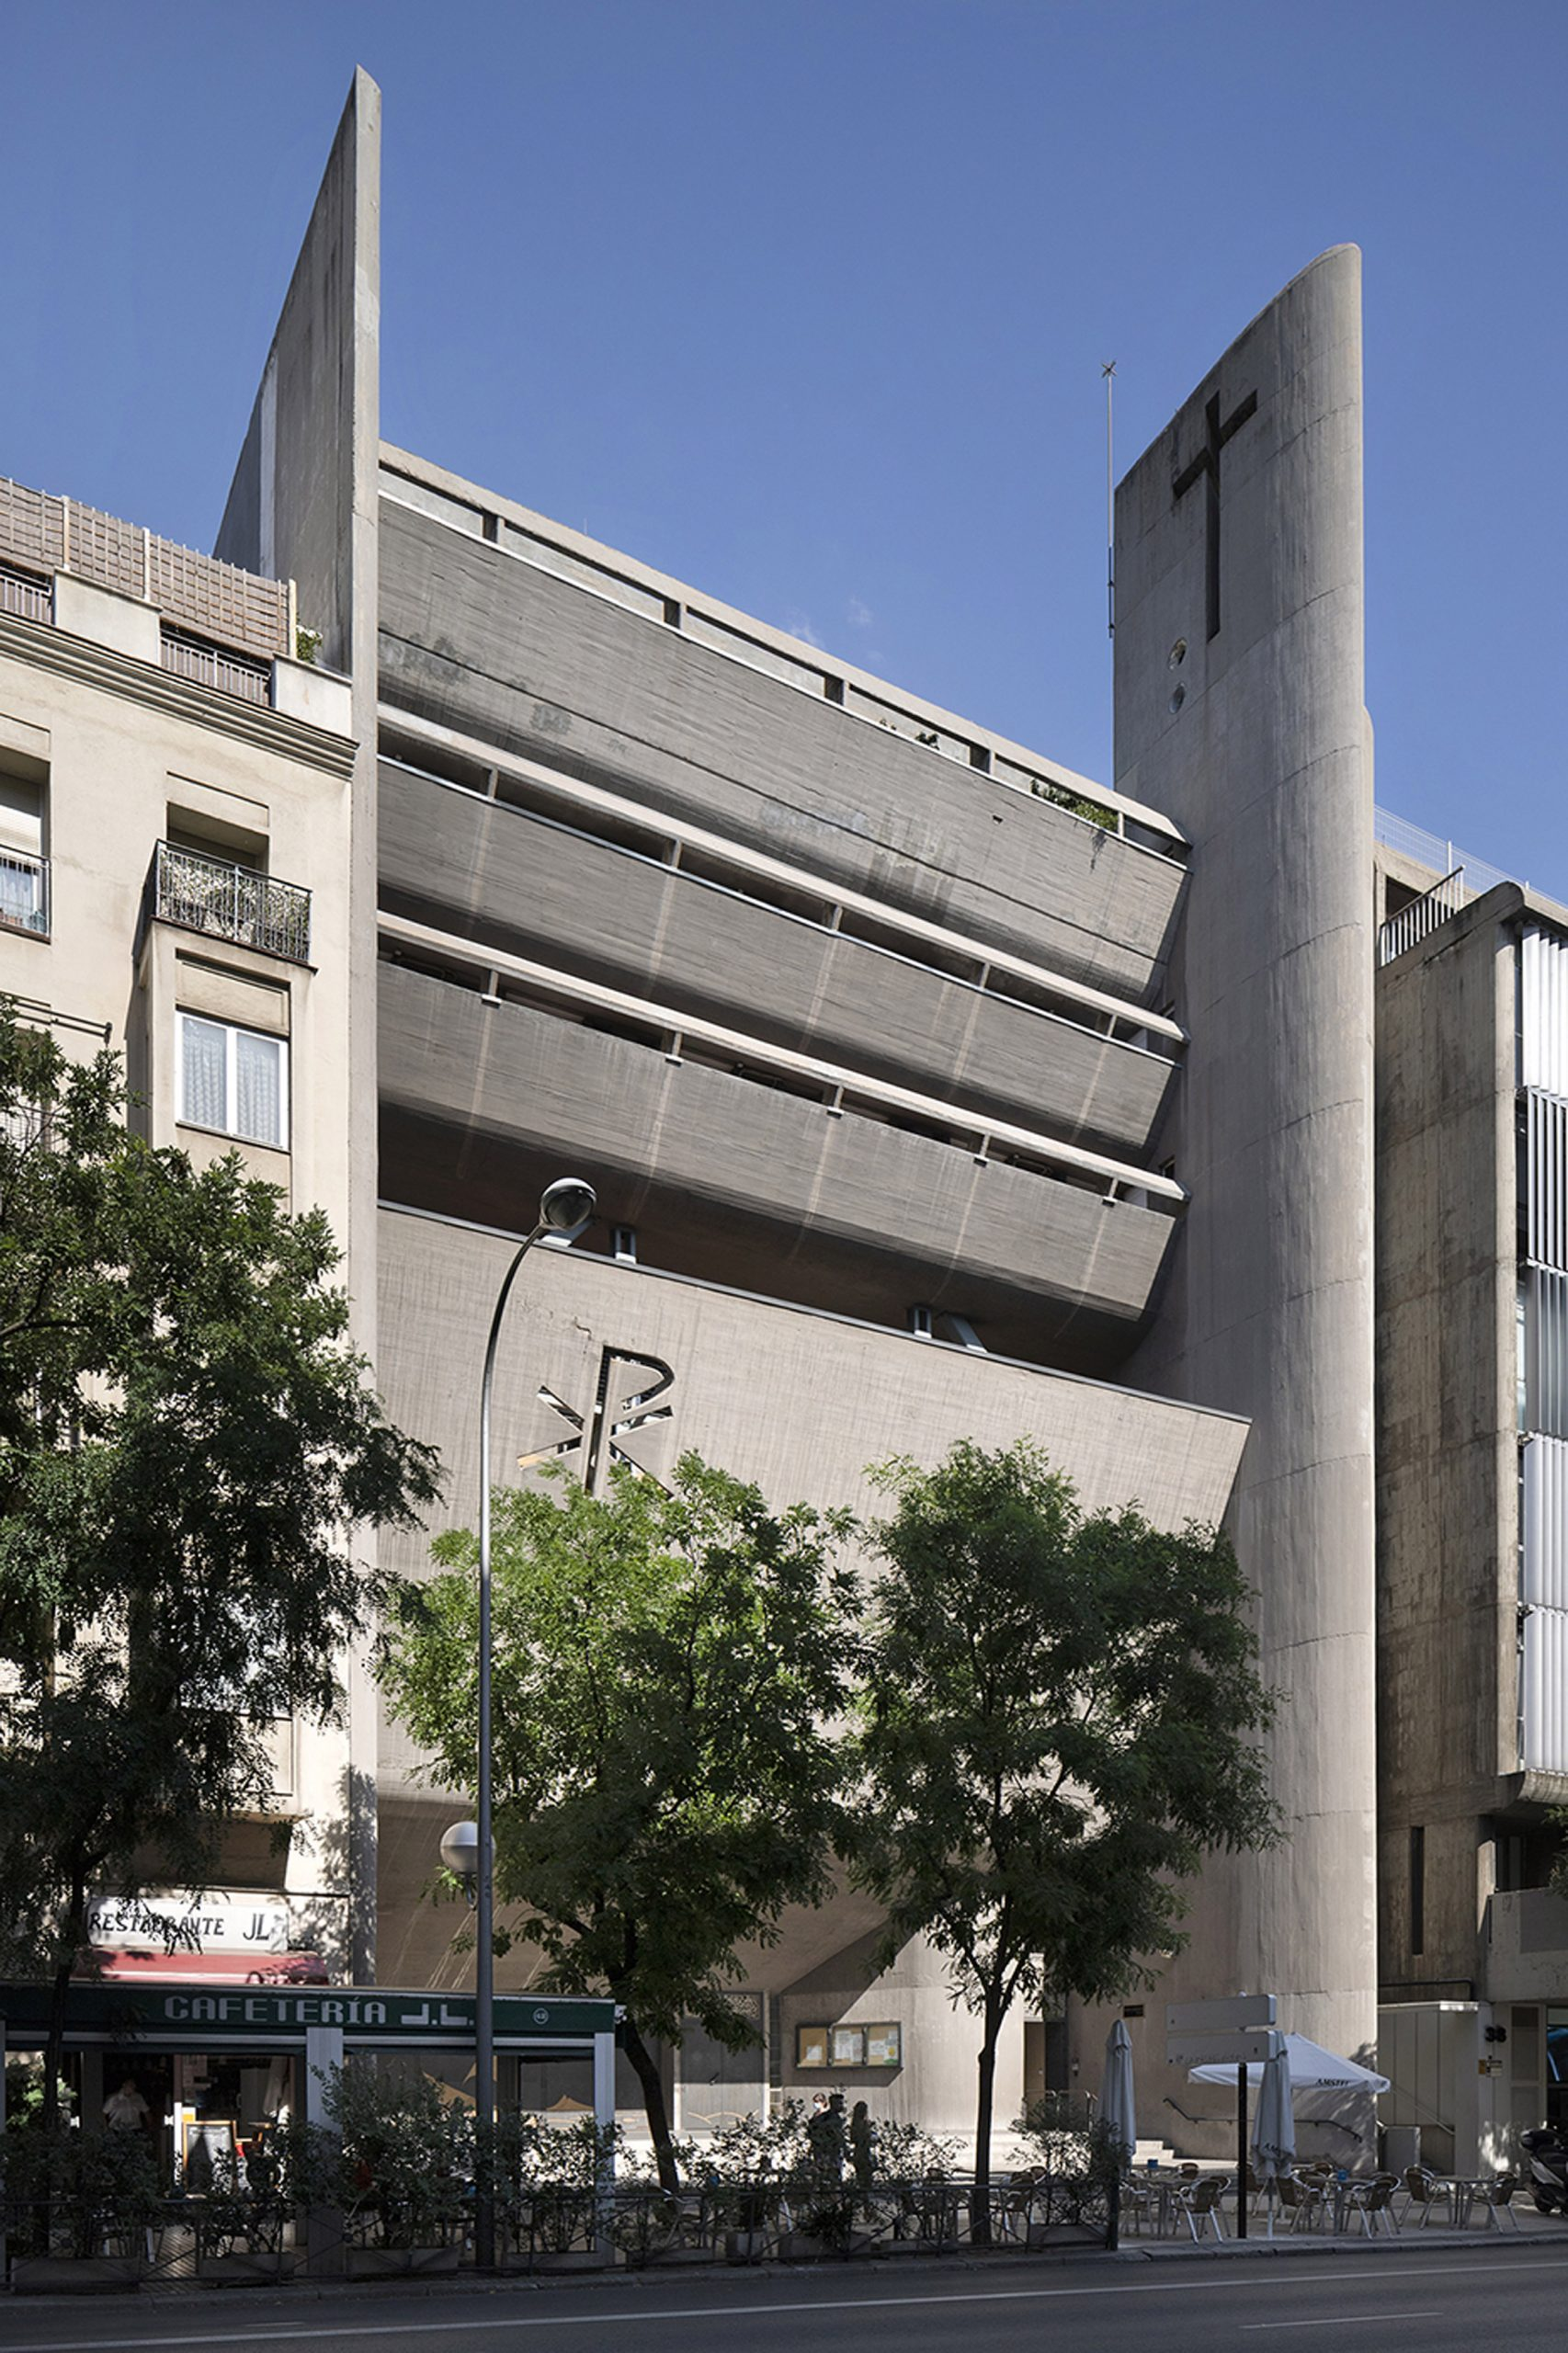 Madrid's brutalist architecture: Nuestra Señora del Rosario de Filipinas church in Madrid